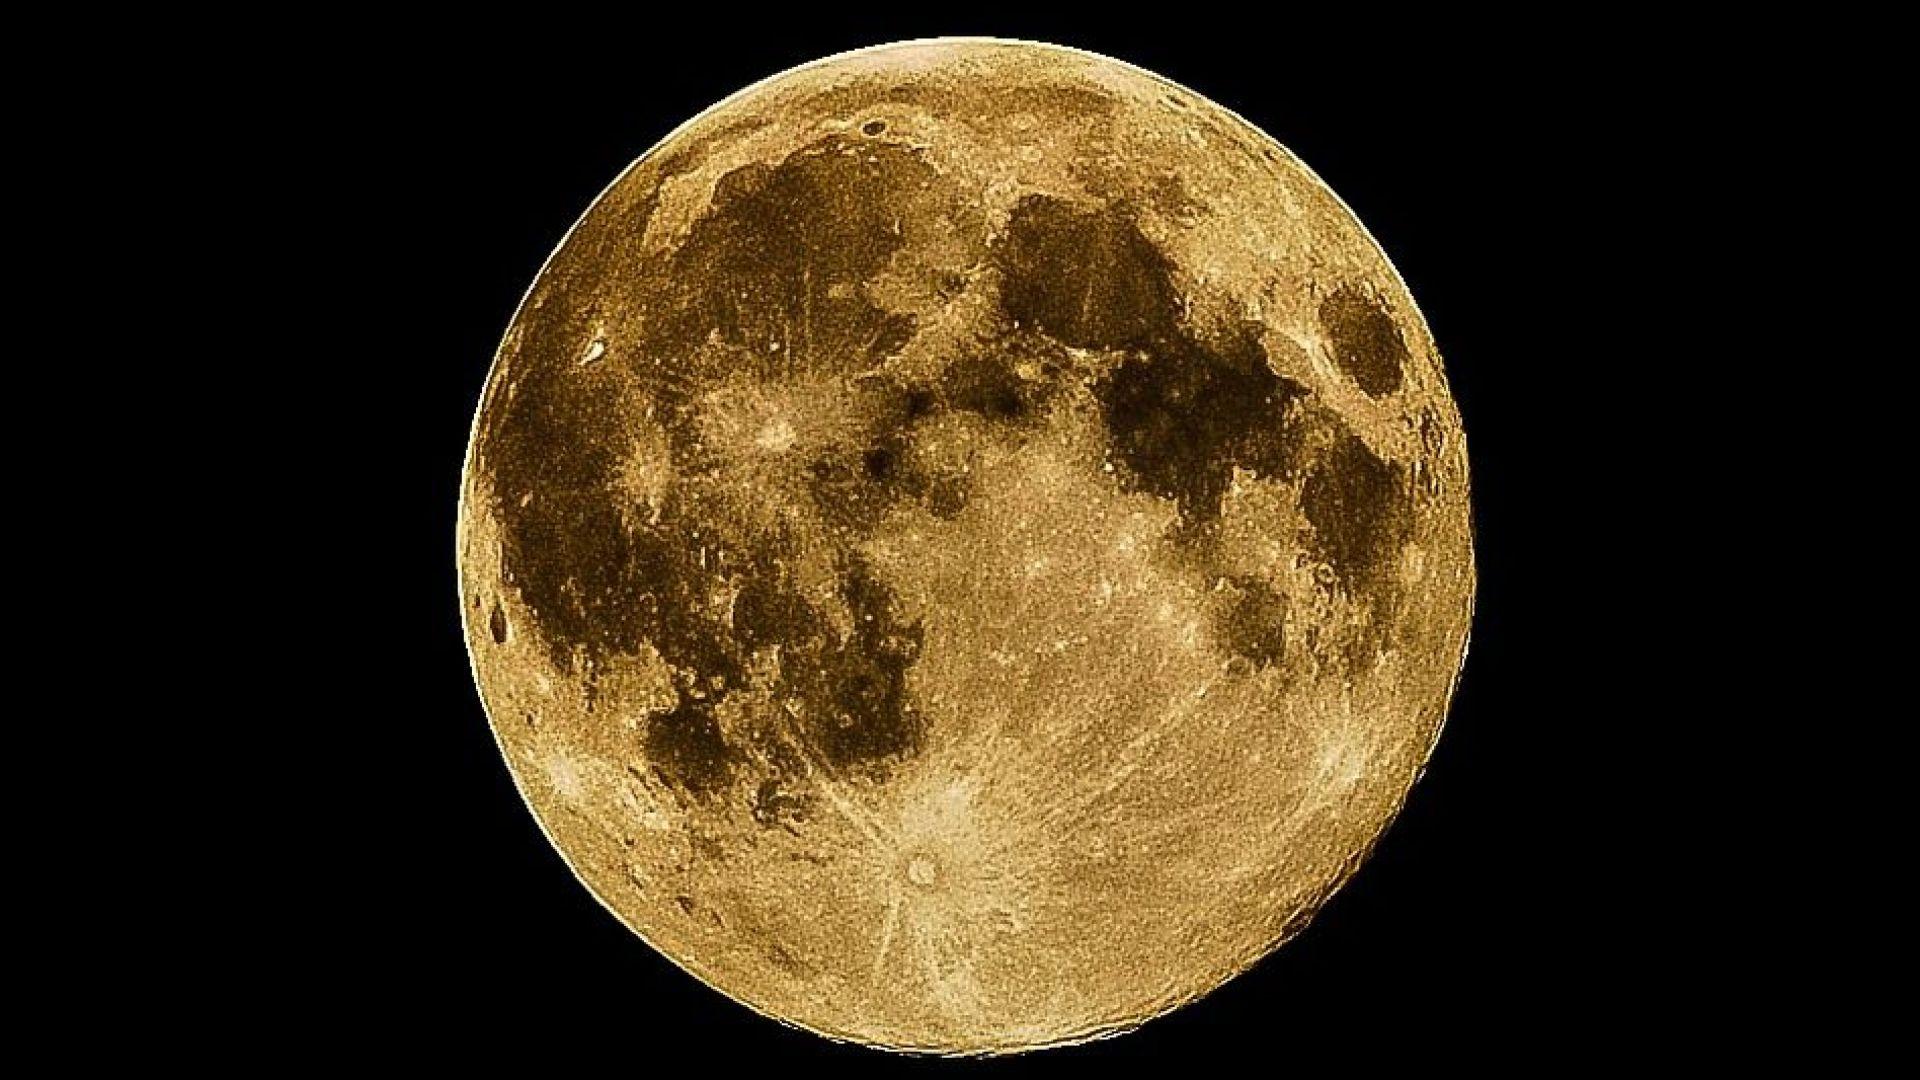 Астрономически календар за 2019 г.